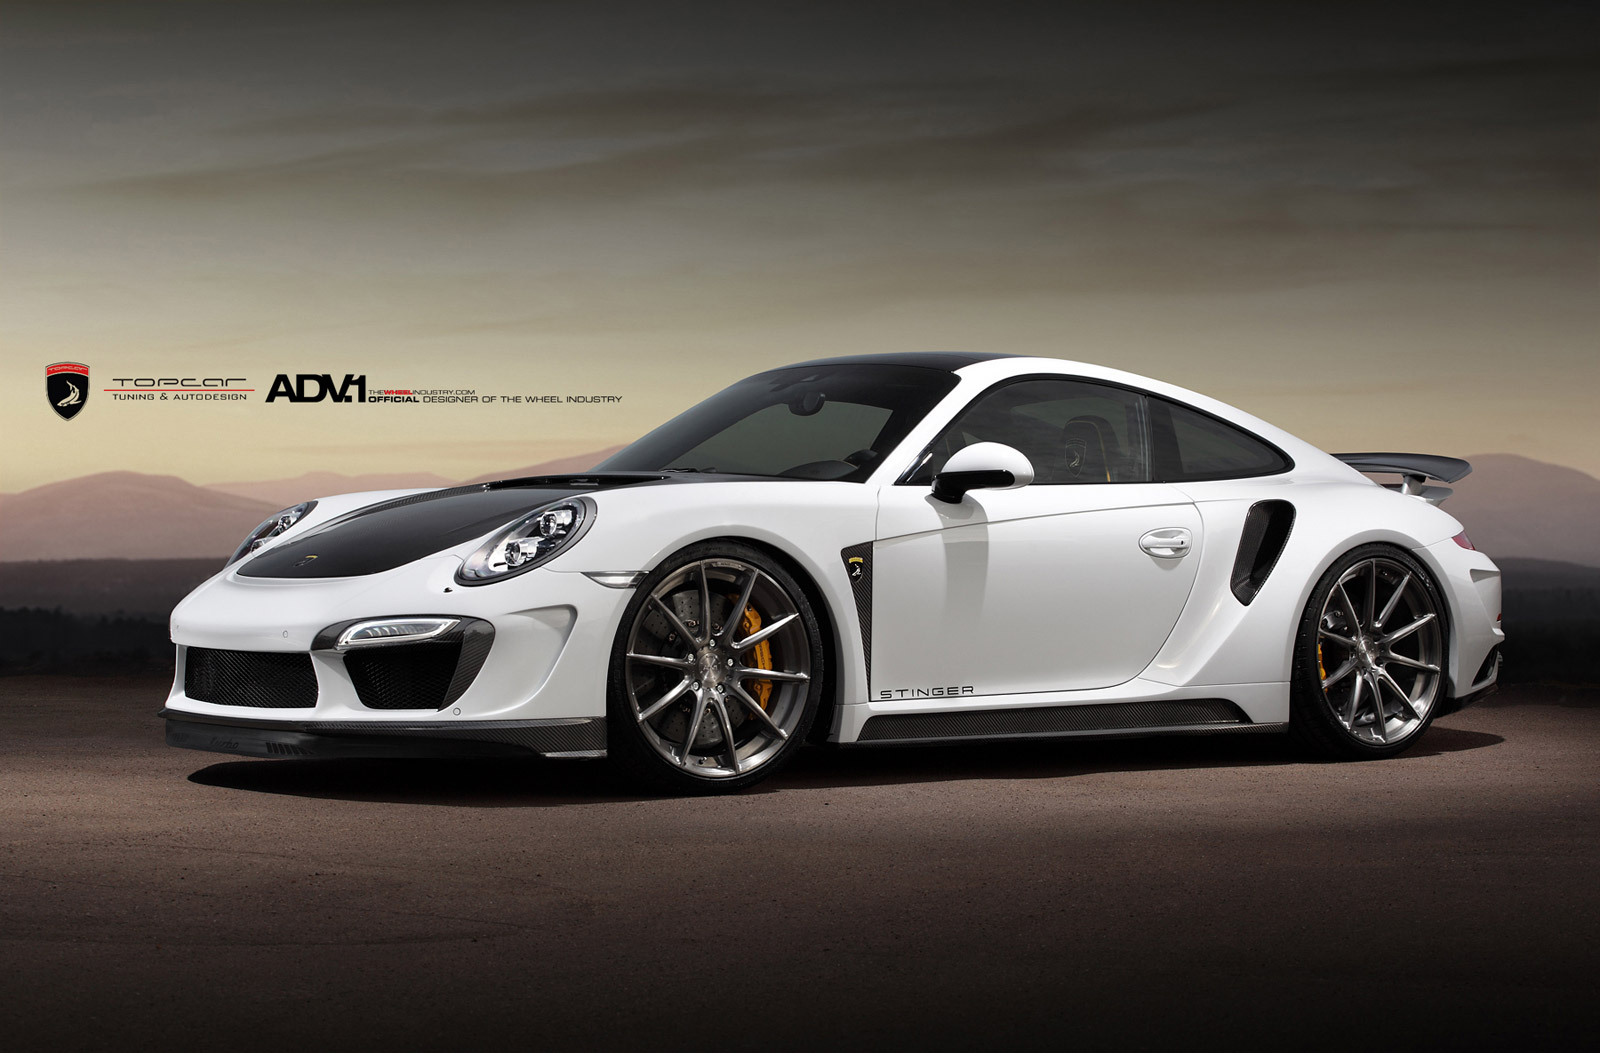 porsche-911-turbo-typ-991-topcar-stinger-gtr-012